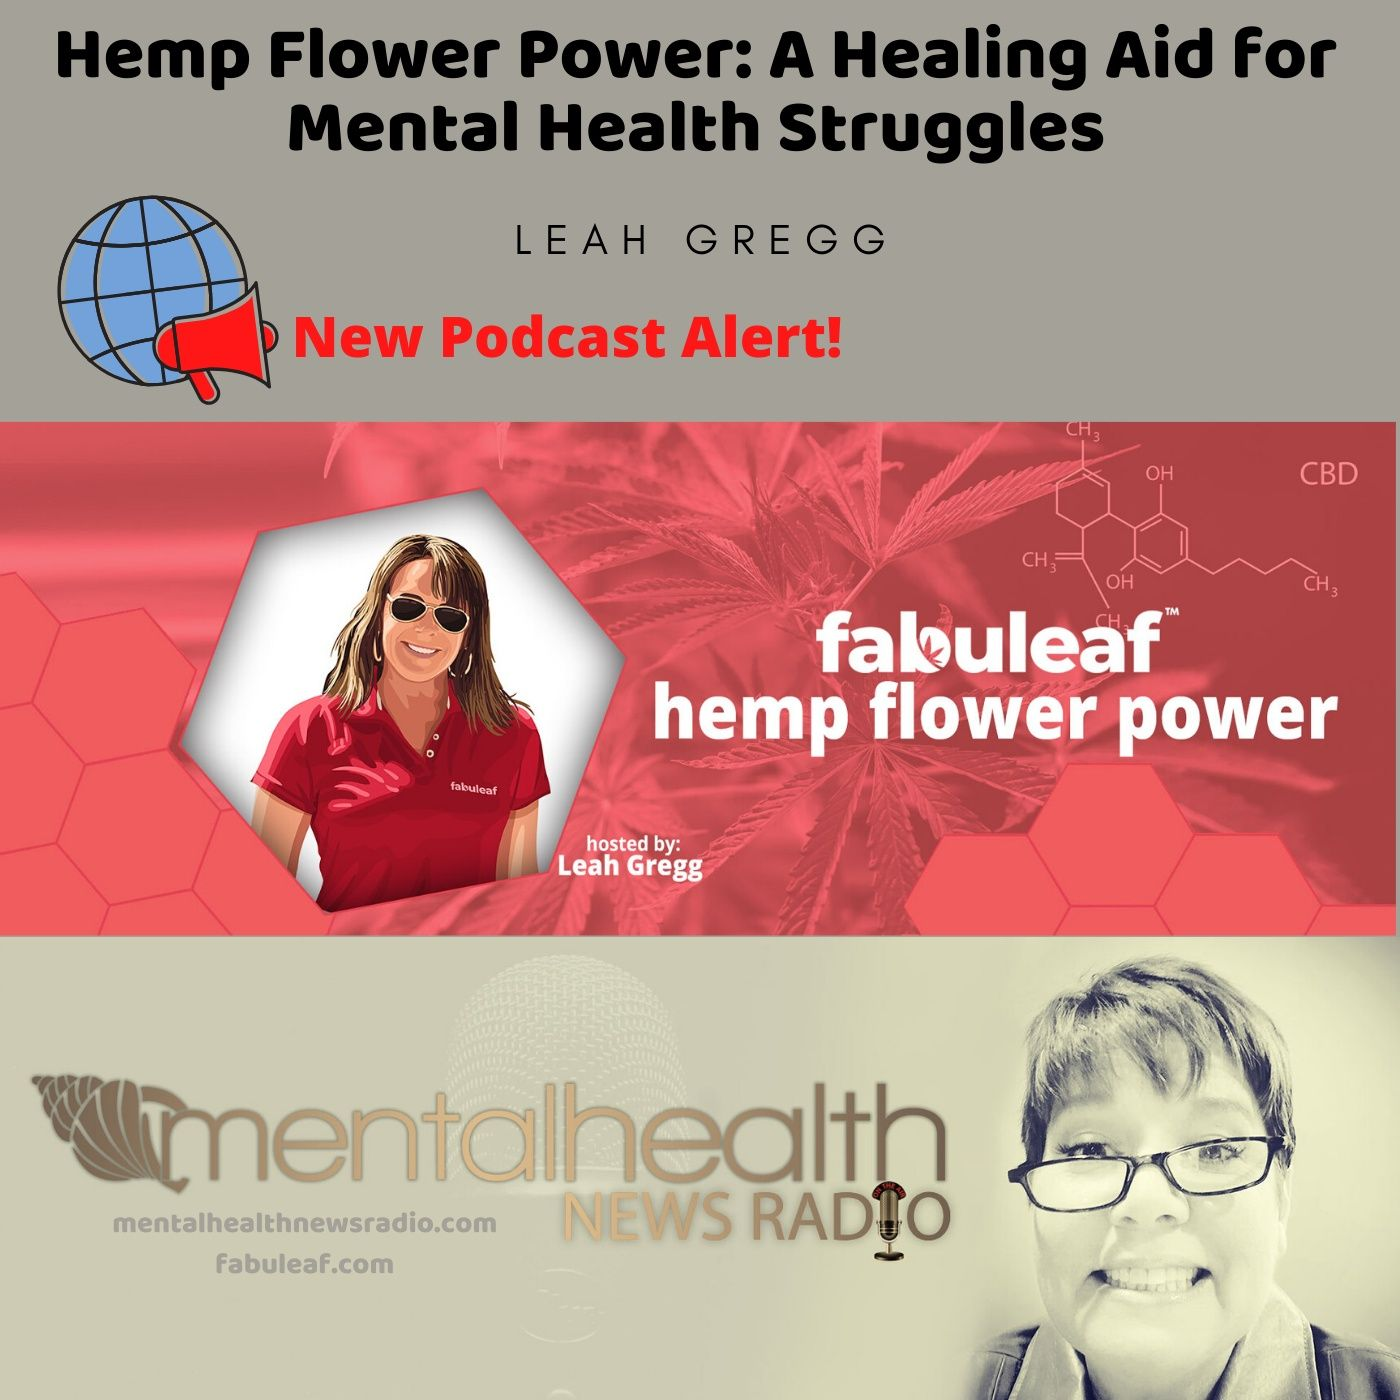 Mental Health News Radio - Hemp Flower Power: A Healing Aid for Mental Health Struggles